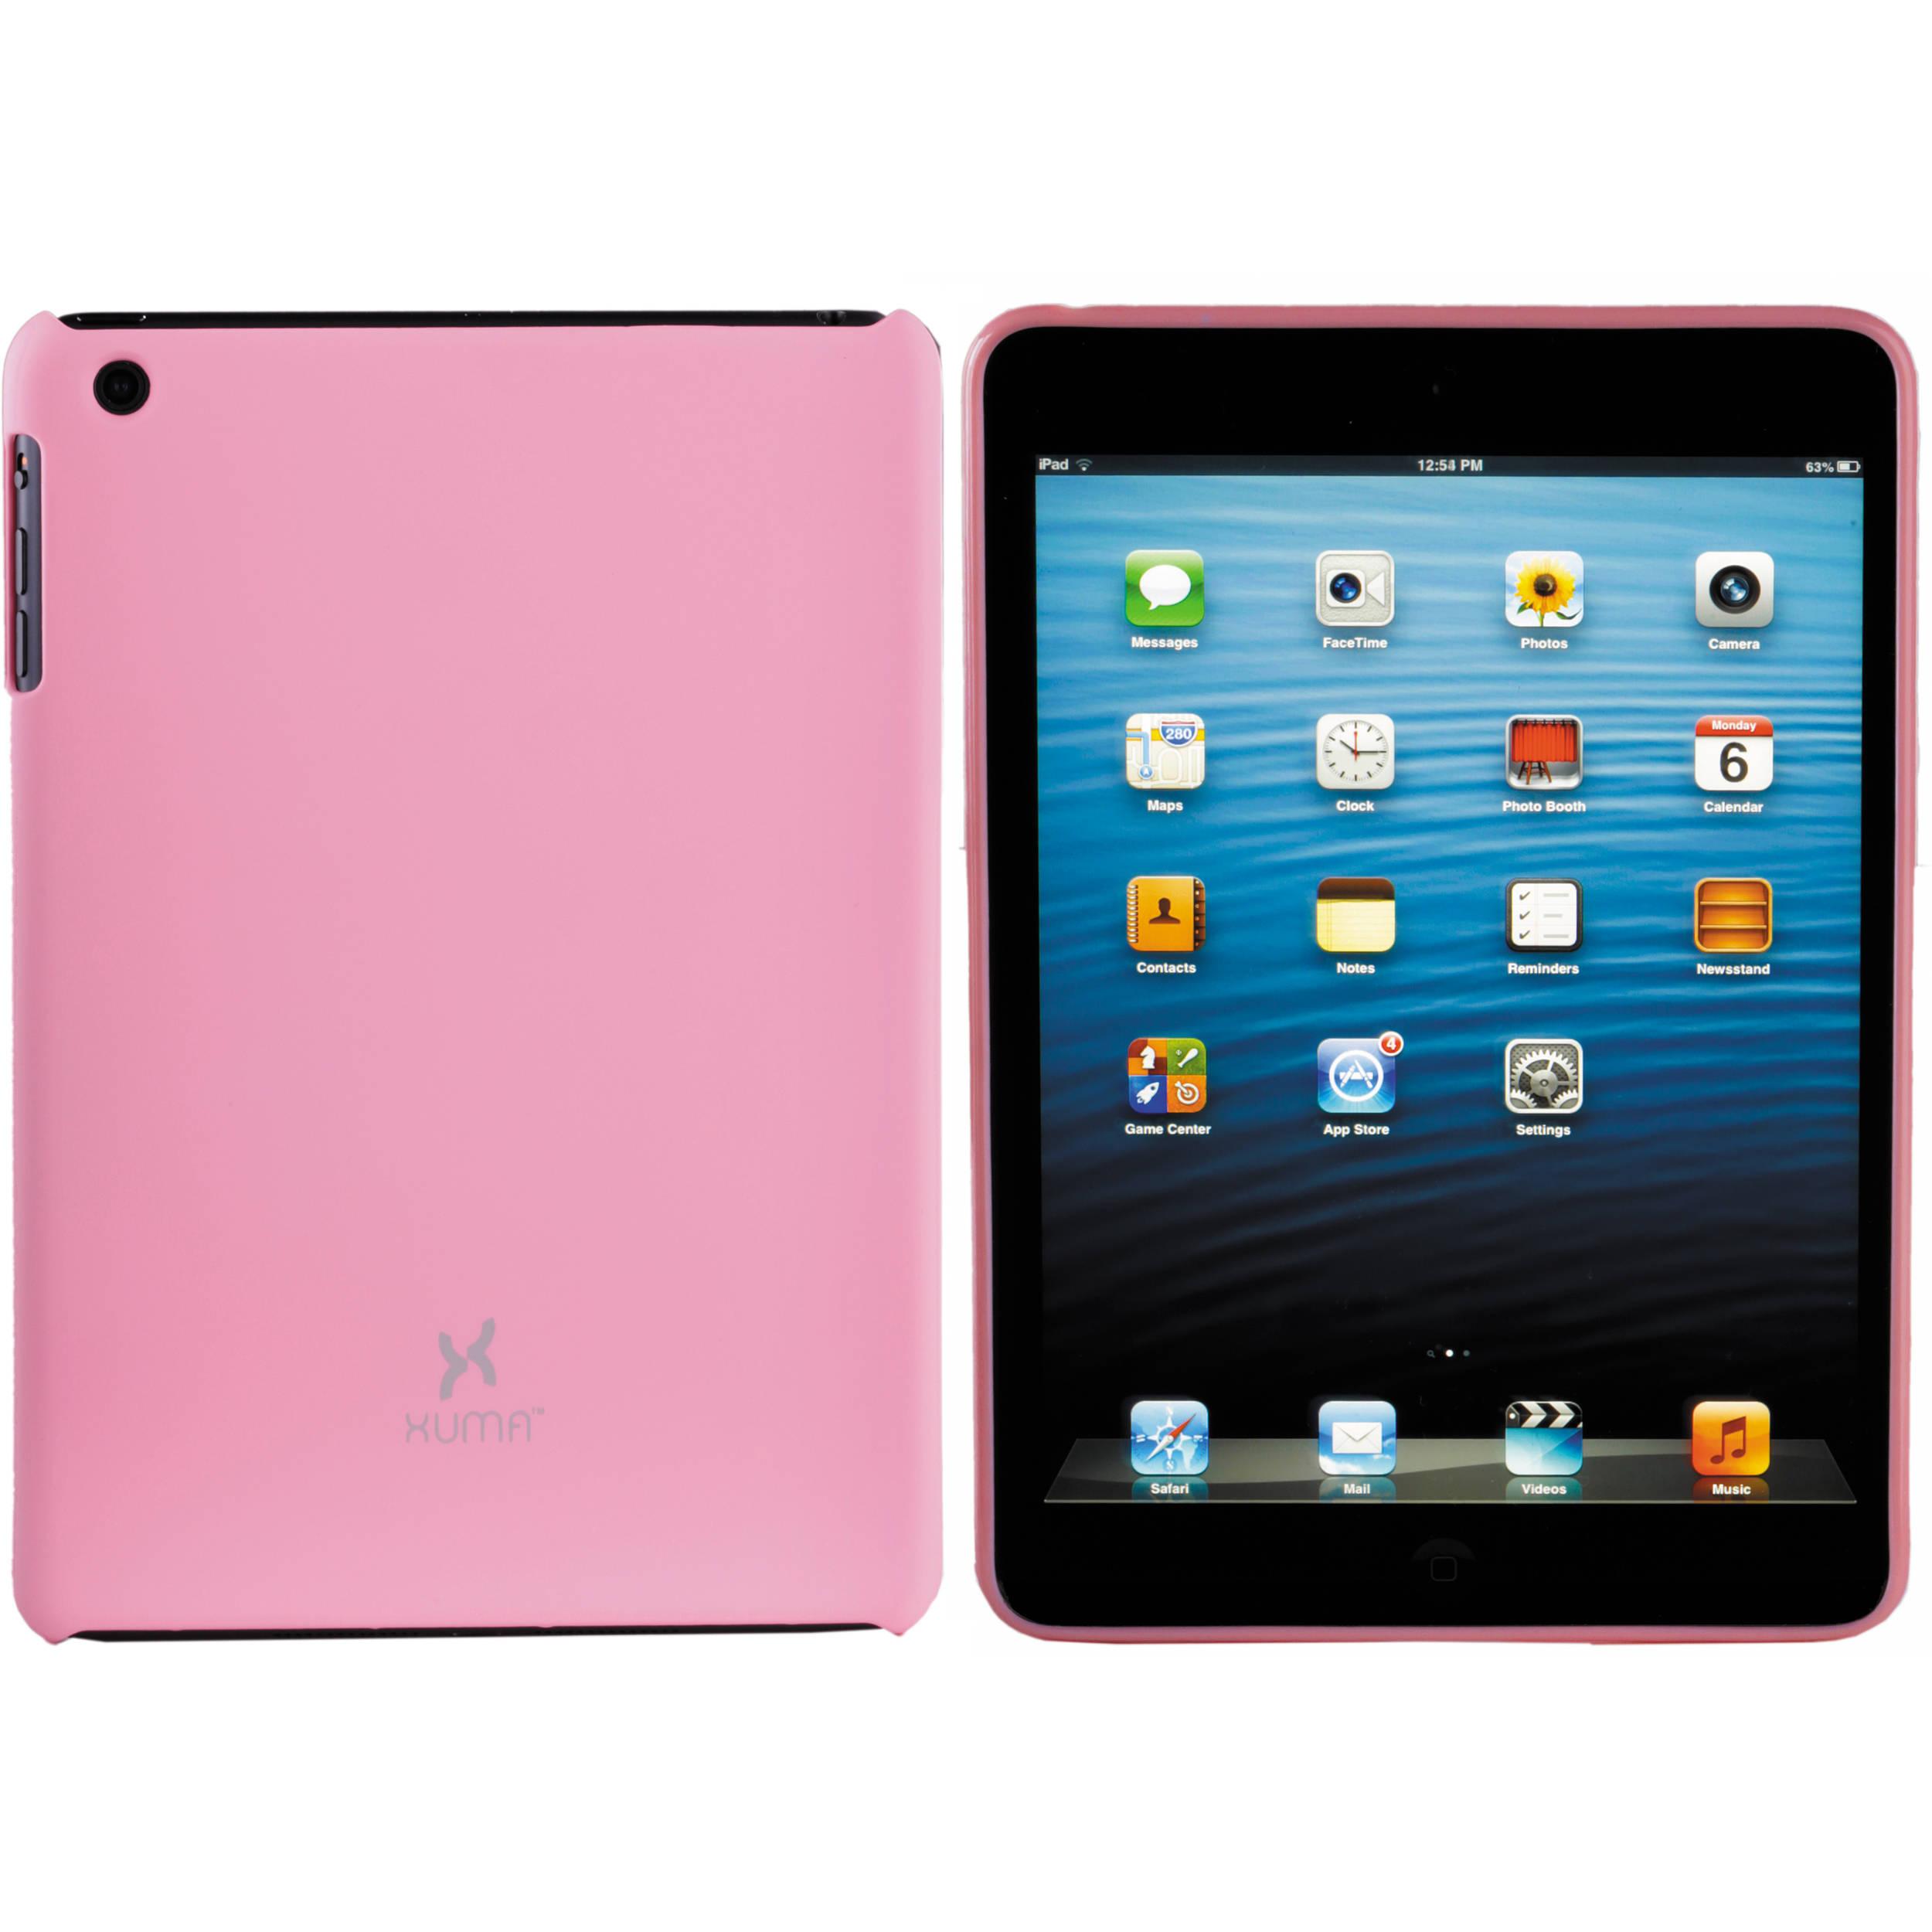 Xuma Hard Snap-on Case for iPad mini 1st Generation (Pink)